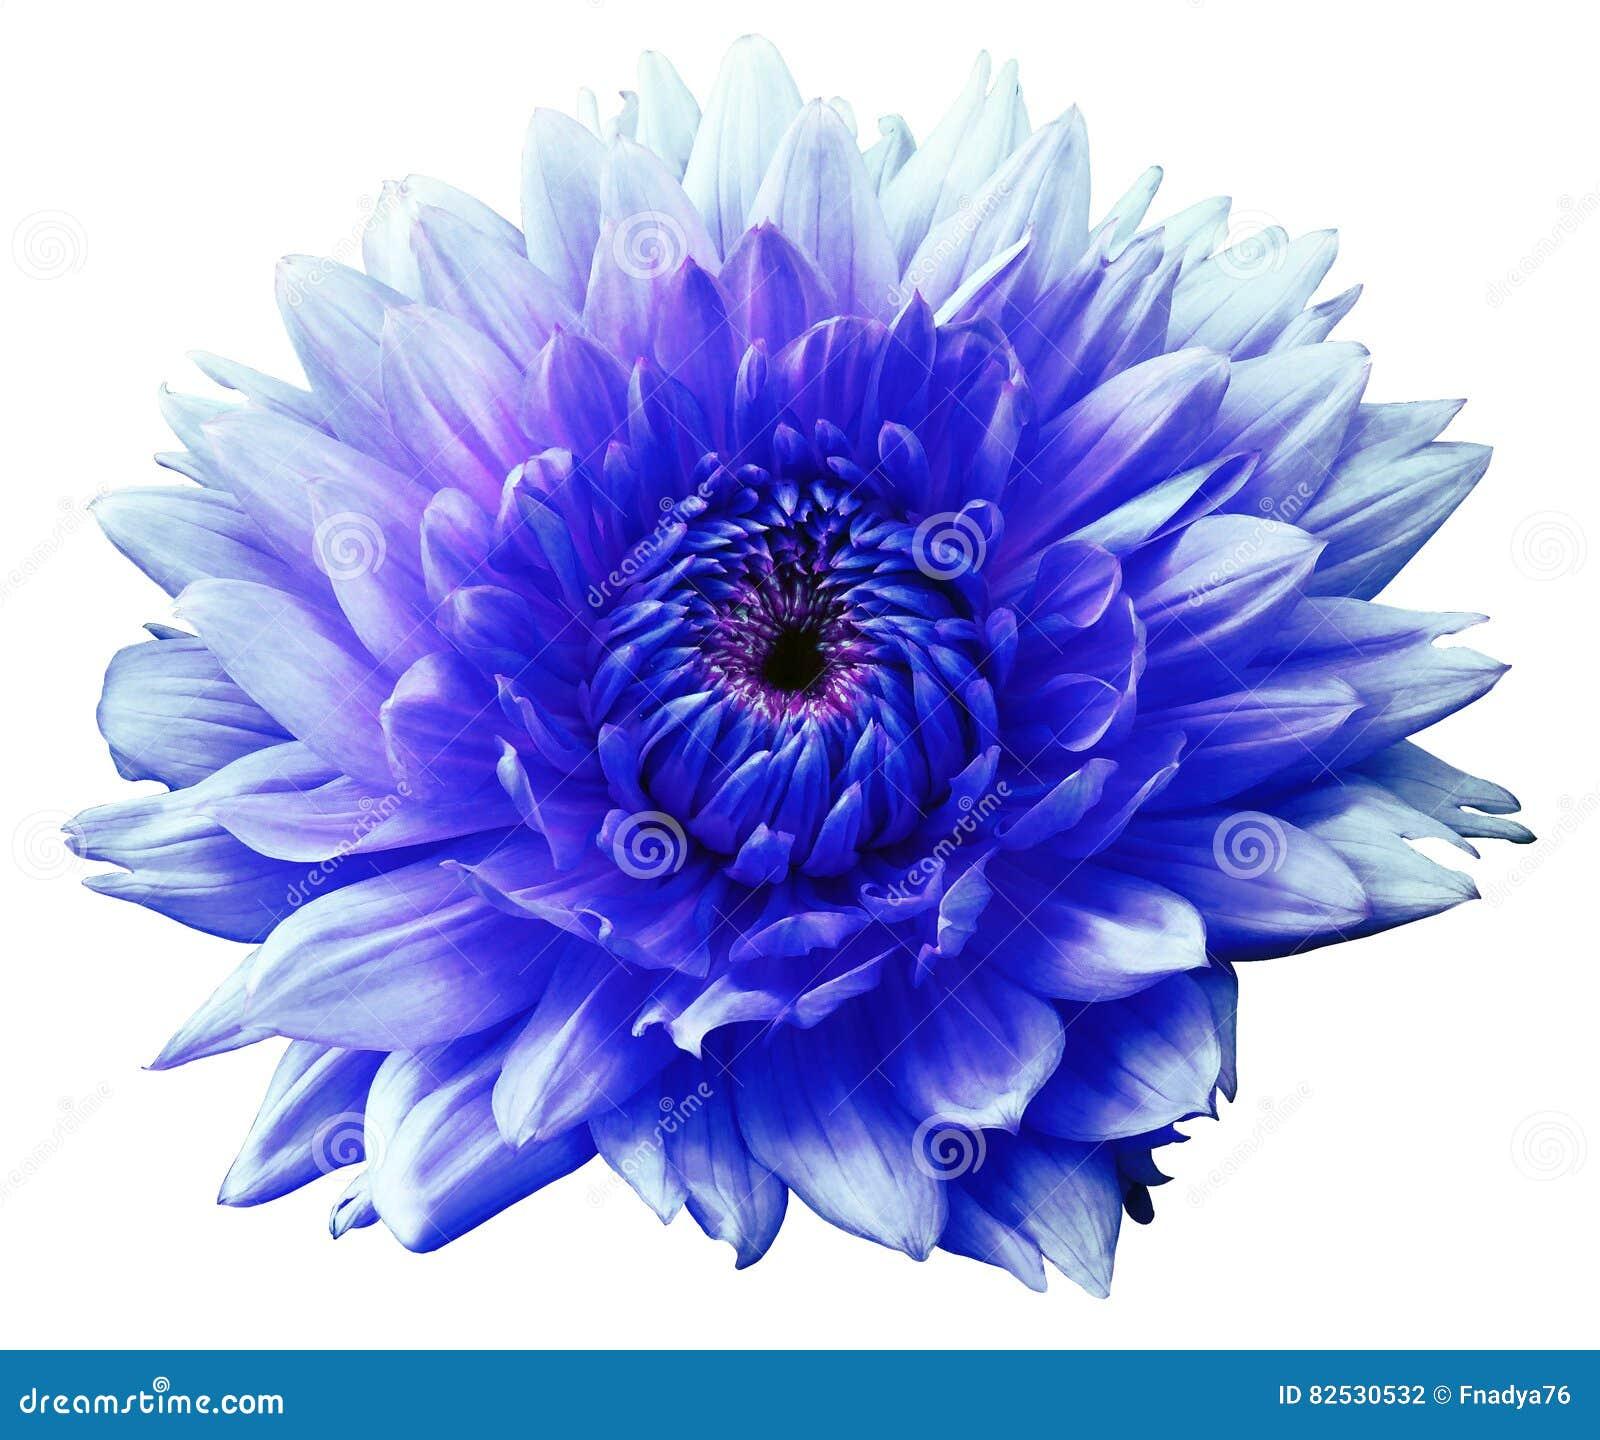 Flower Blue Turquoise Motley Dahlia Isolated On A White Background